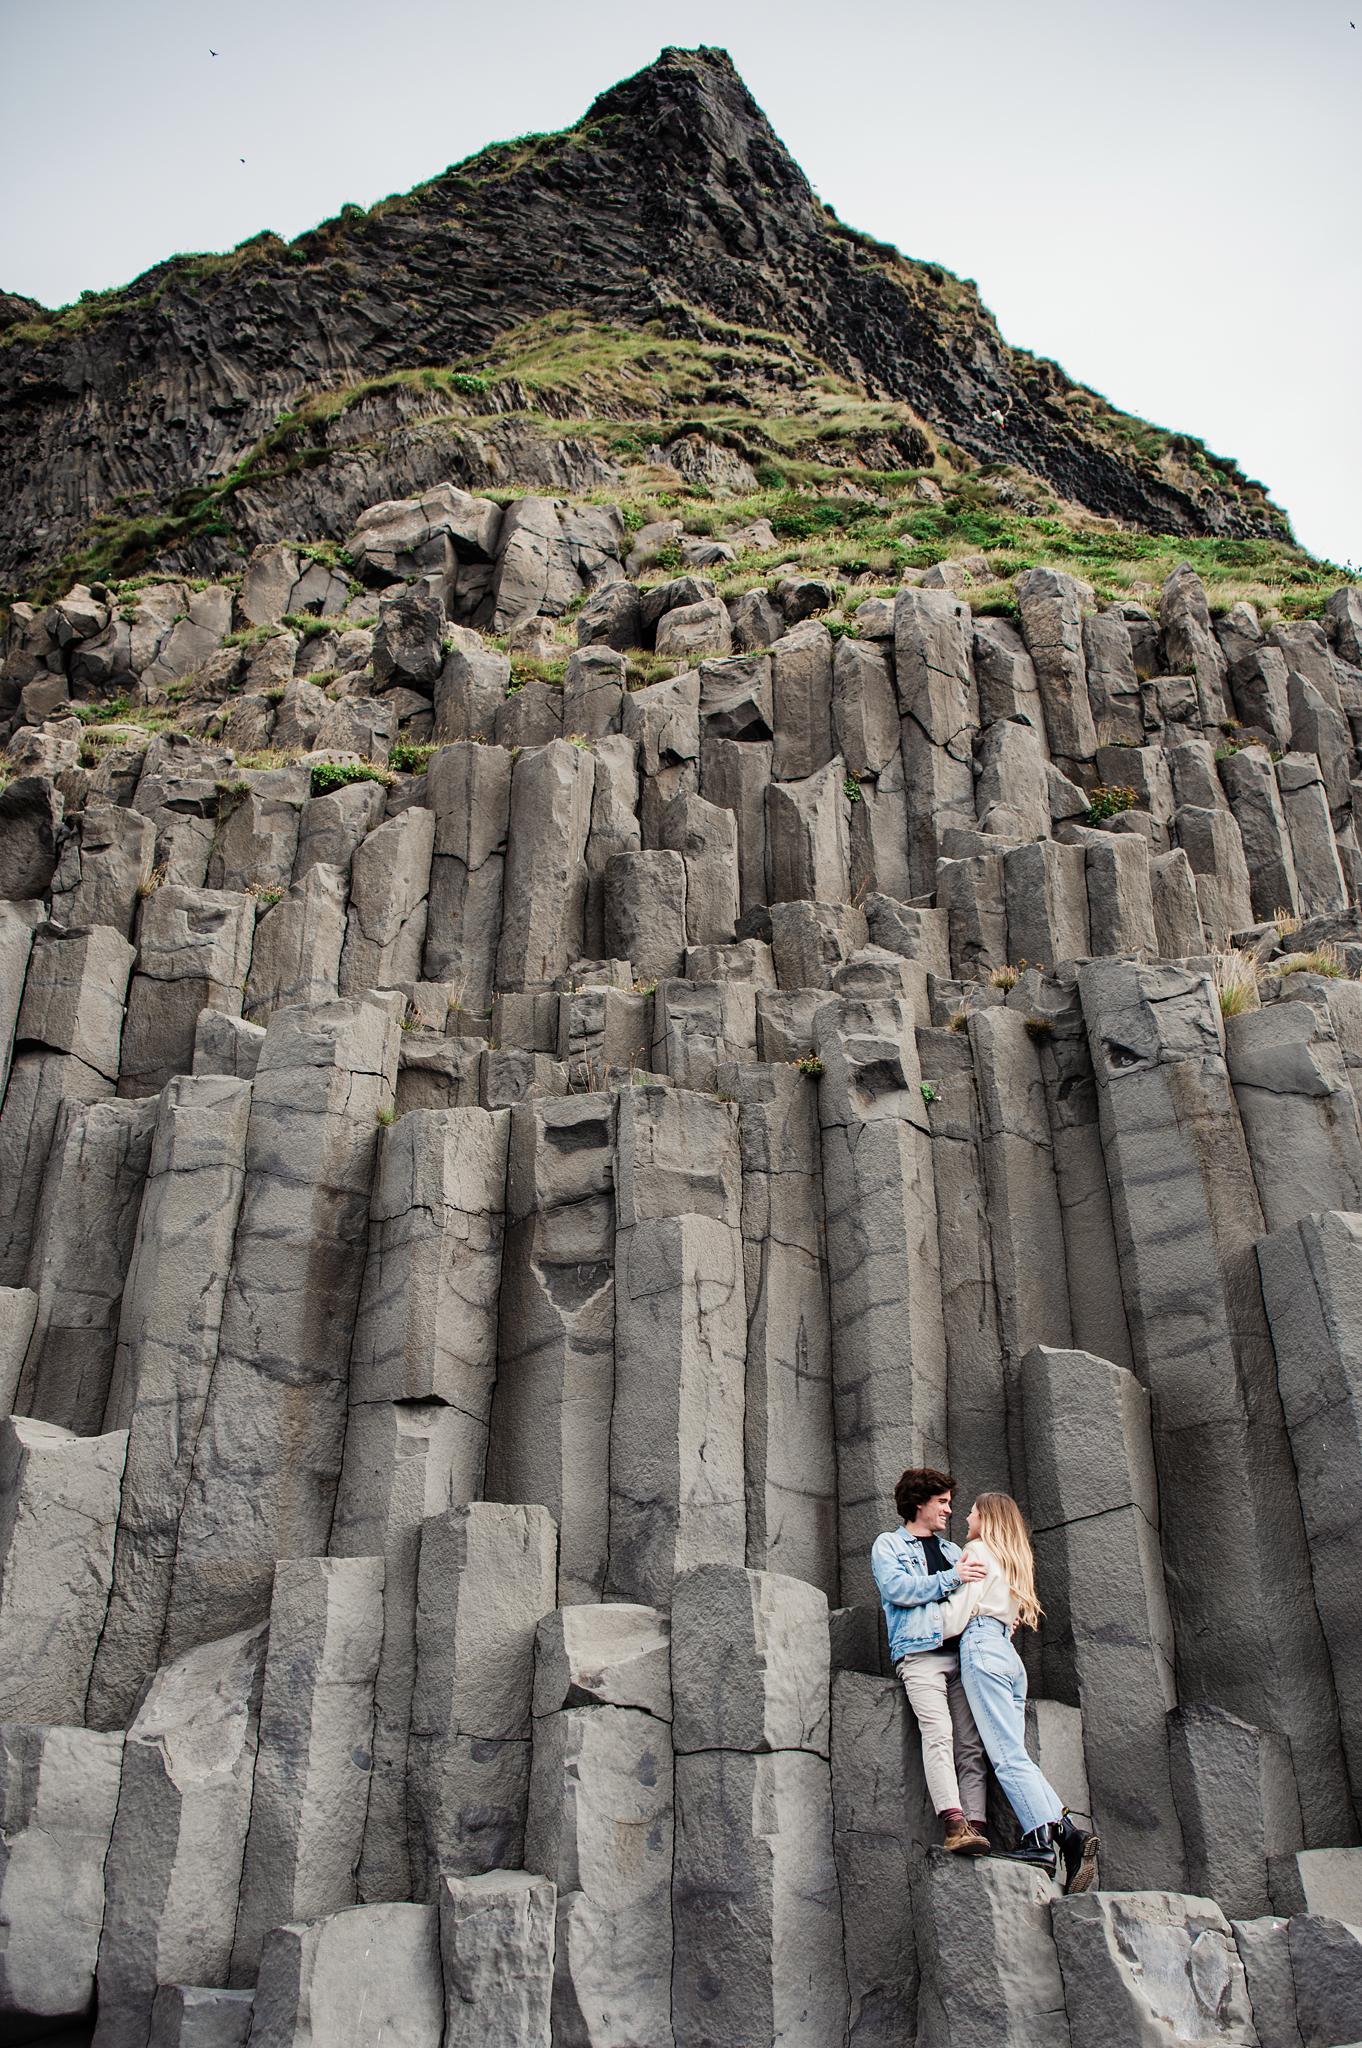 Iceland_Reynisfjara_Black_Sand_Beach_Couples_Session_JILL_STUDIO_Rochester_NY_Photographer_DSC_9758.jpg